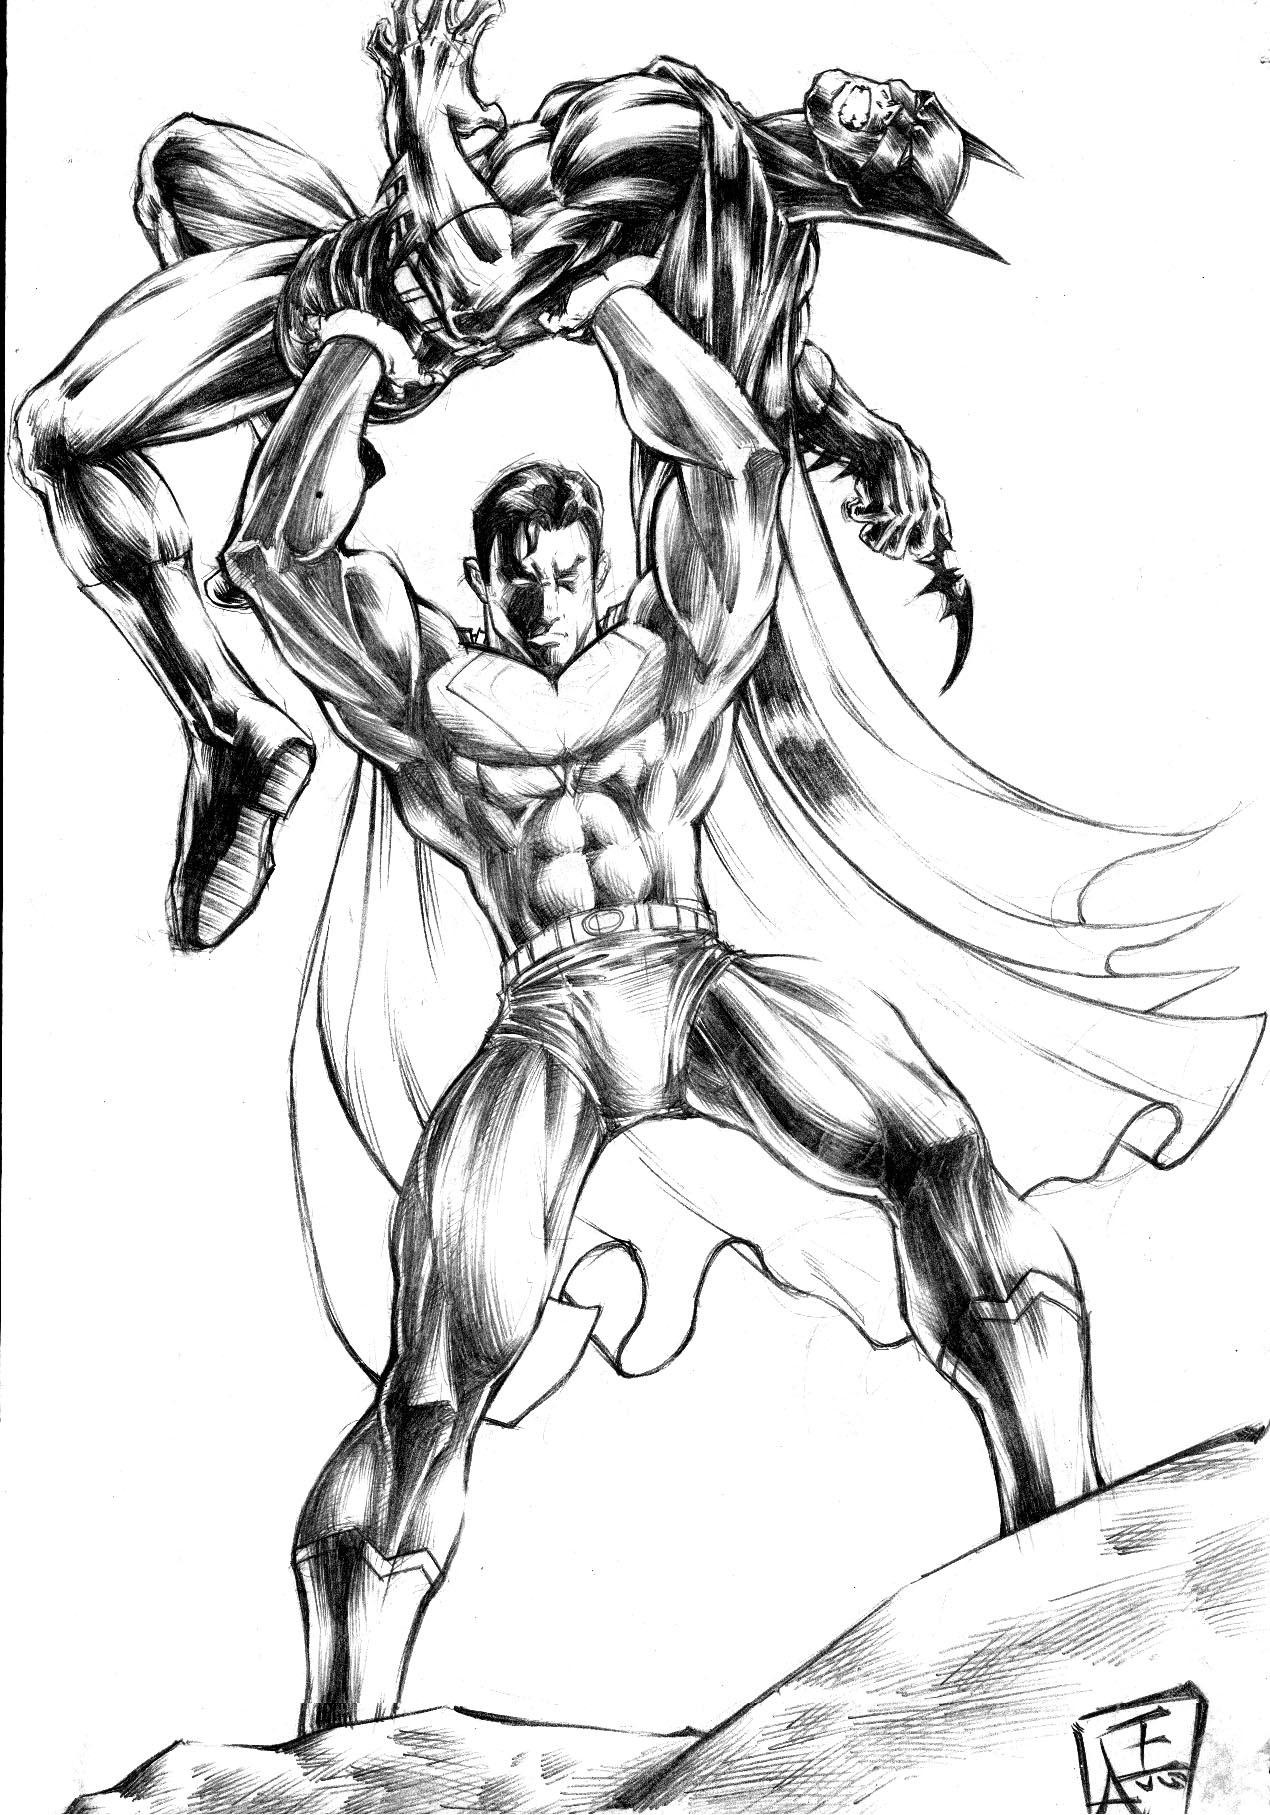 batman vs superman injustice coloring pages | batman vs. superman by omegaseraphx on DeviantArt